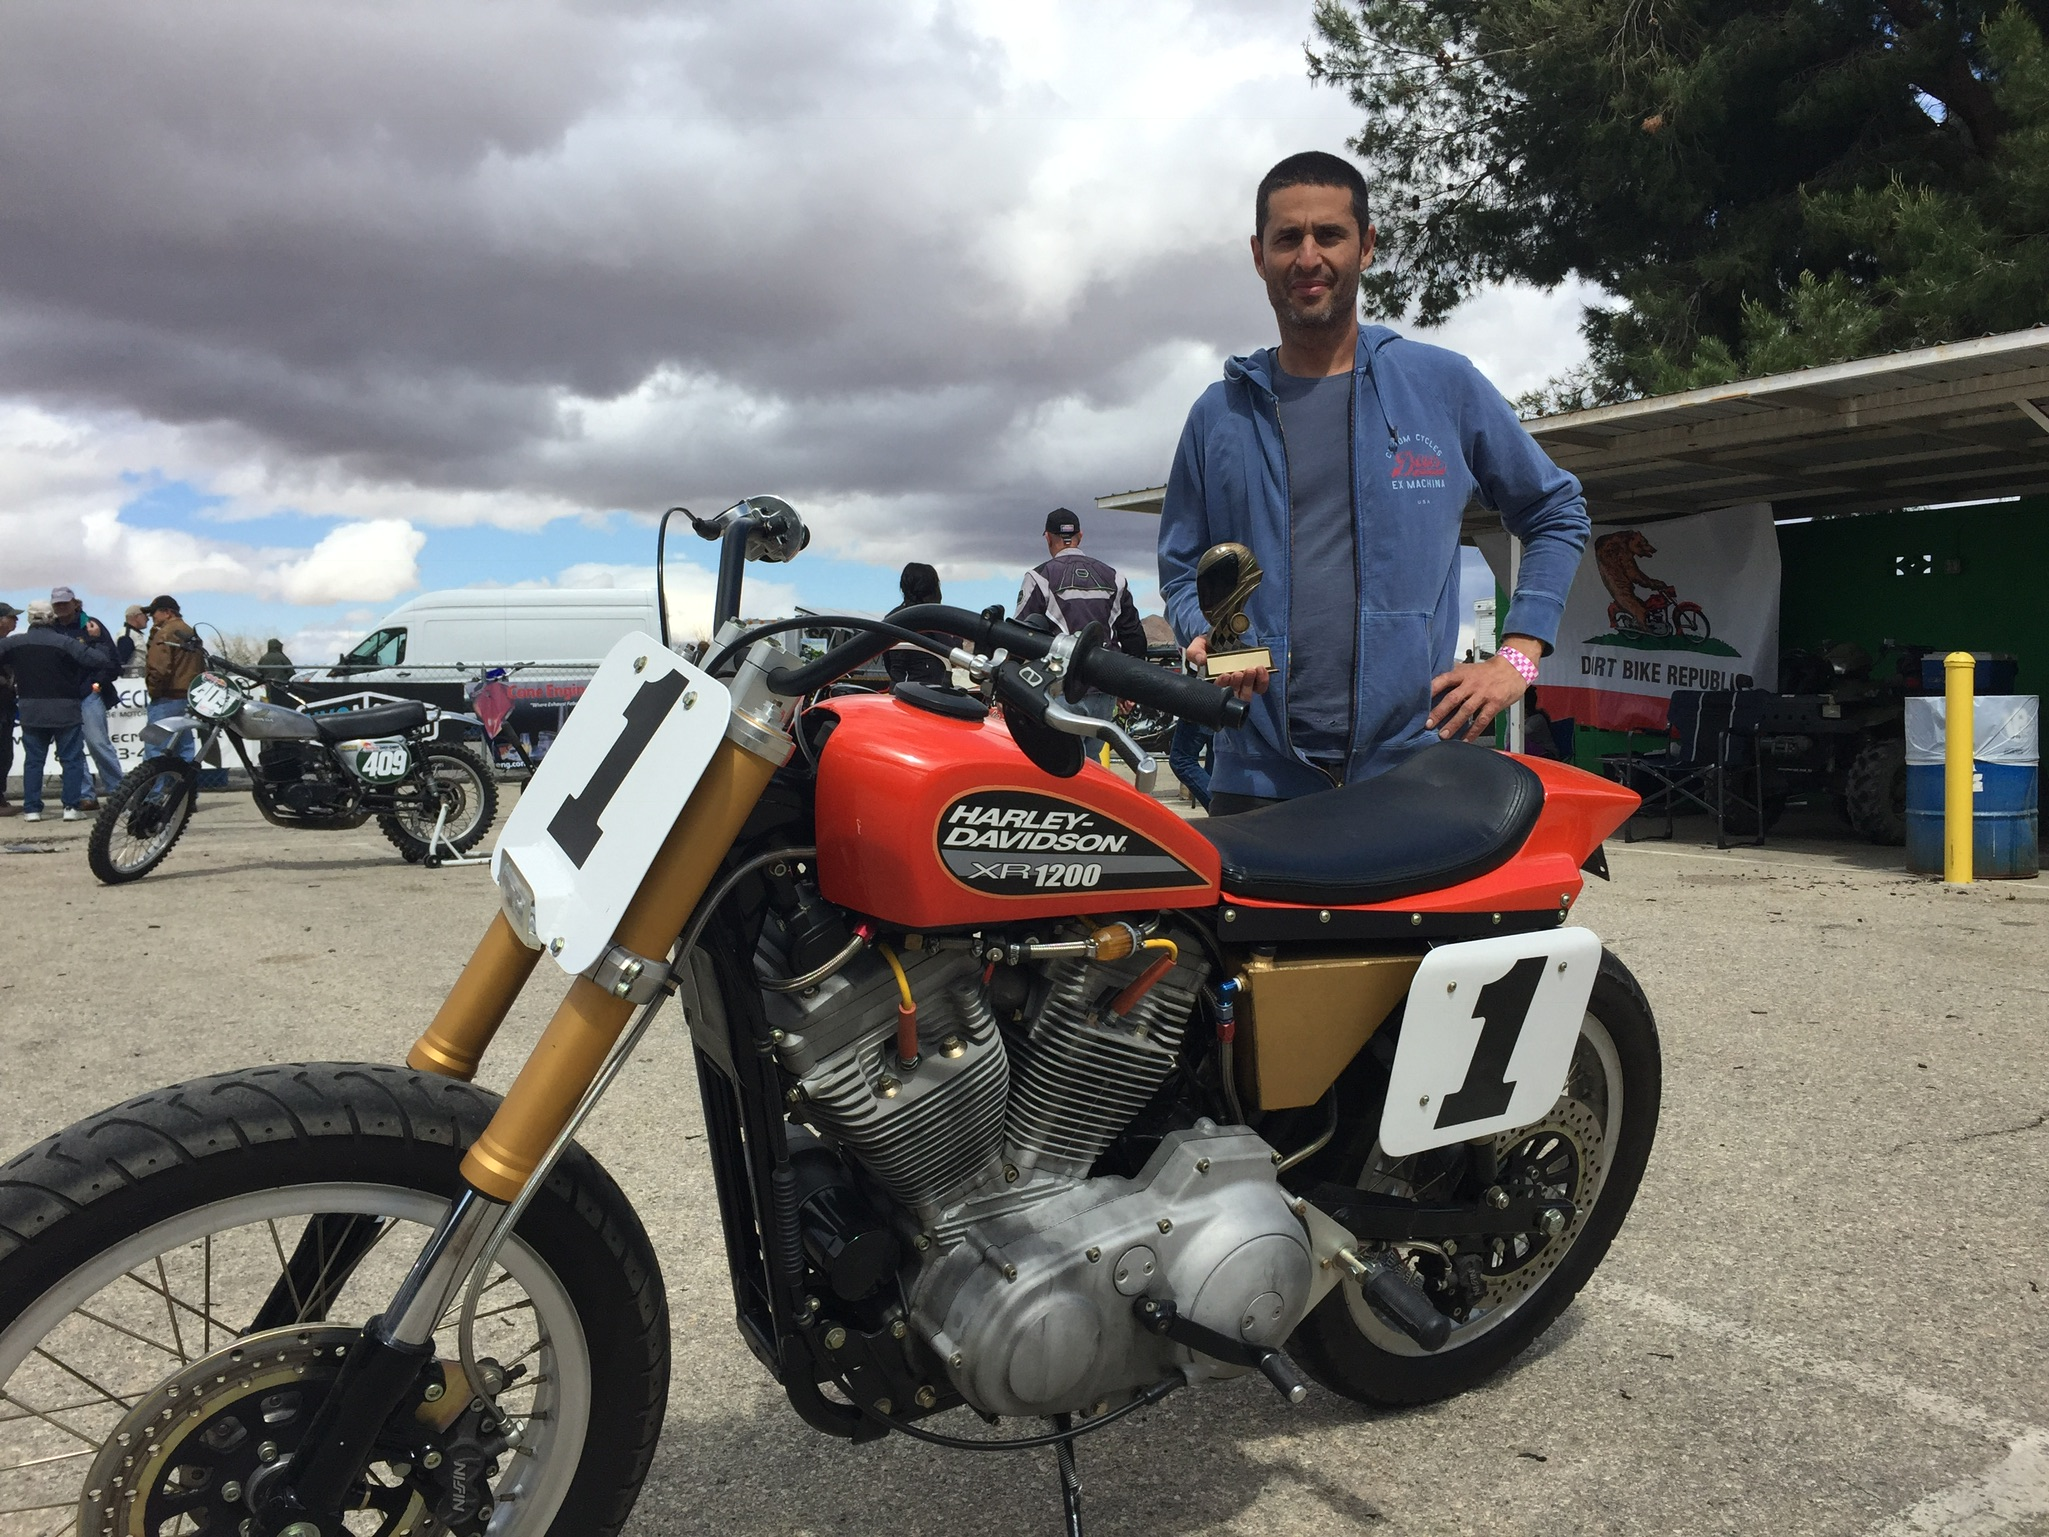 Winner - Best American Custom - Motoclassica Motorcycle Show, Willow Springs April 2015